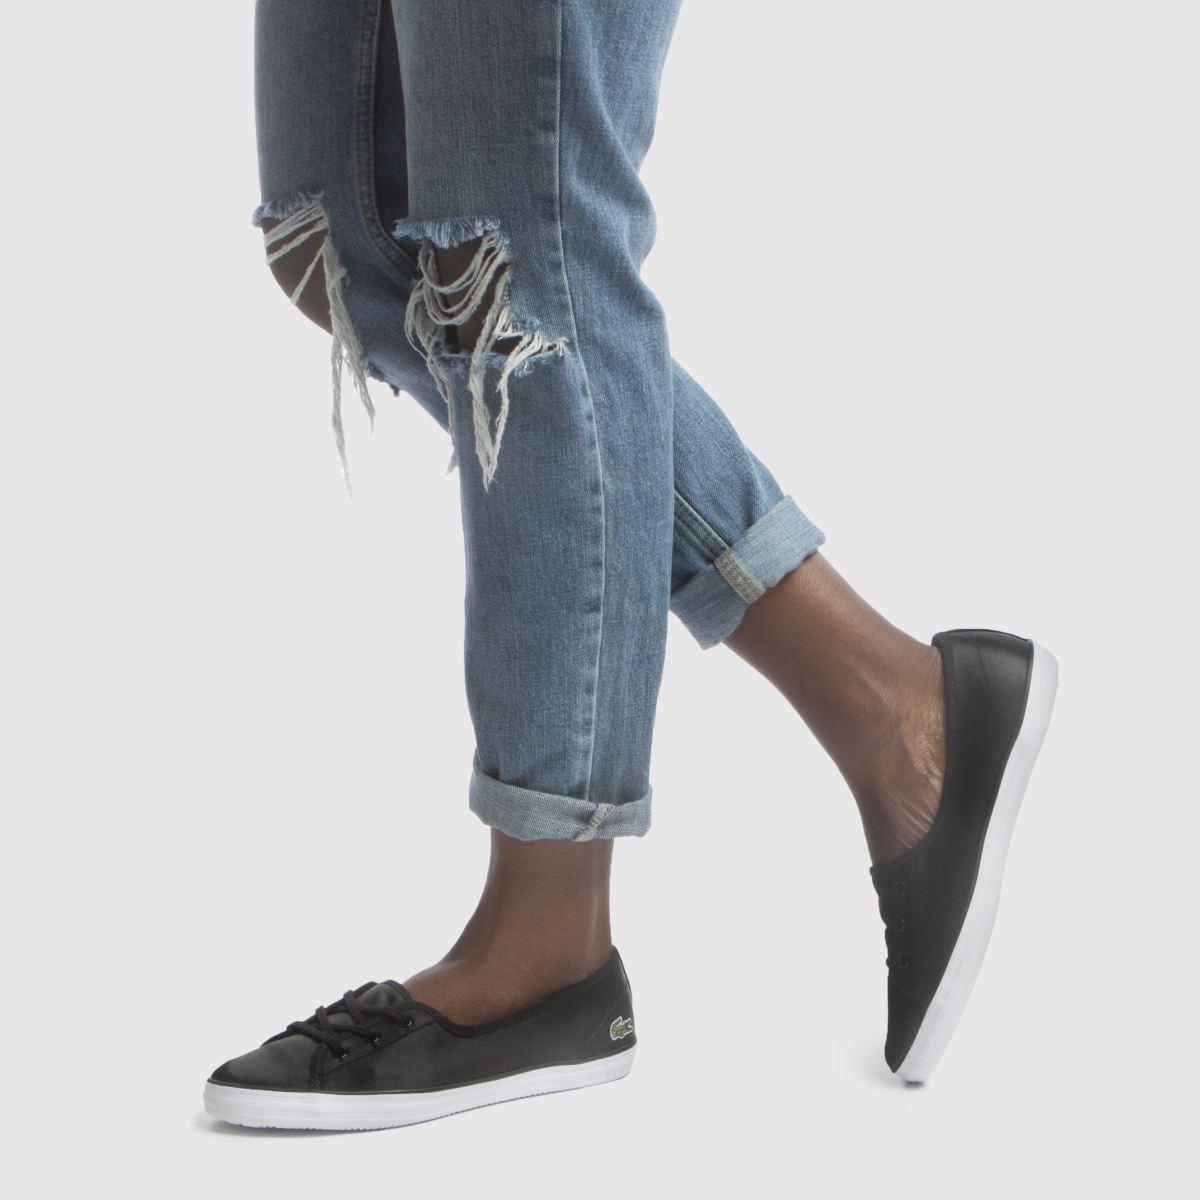 Damen Schwarz Gute lacoste Ziane Chunky Sneaker | schuh Gute Schwarz Qualität beliebte Schuhe 4fde05